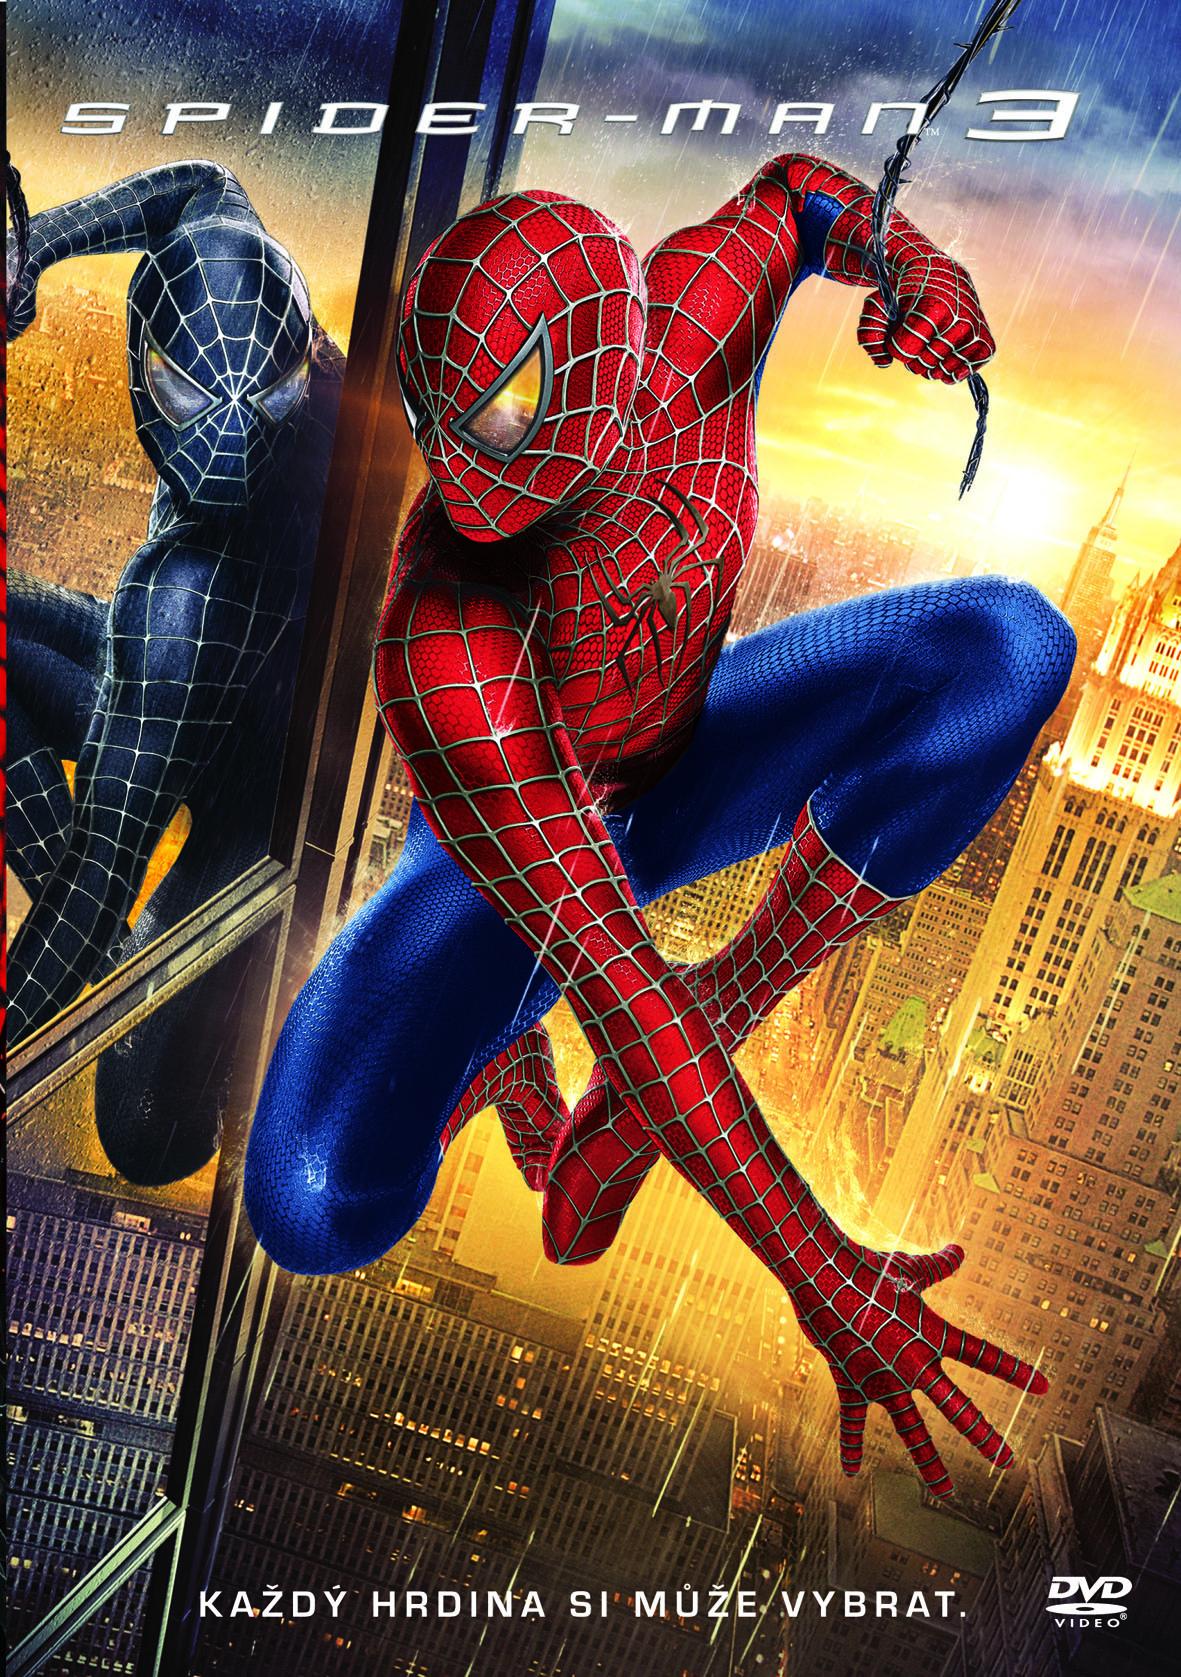 Spustit online film zdarma Spider-Man 3